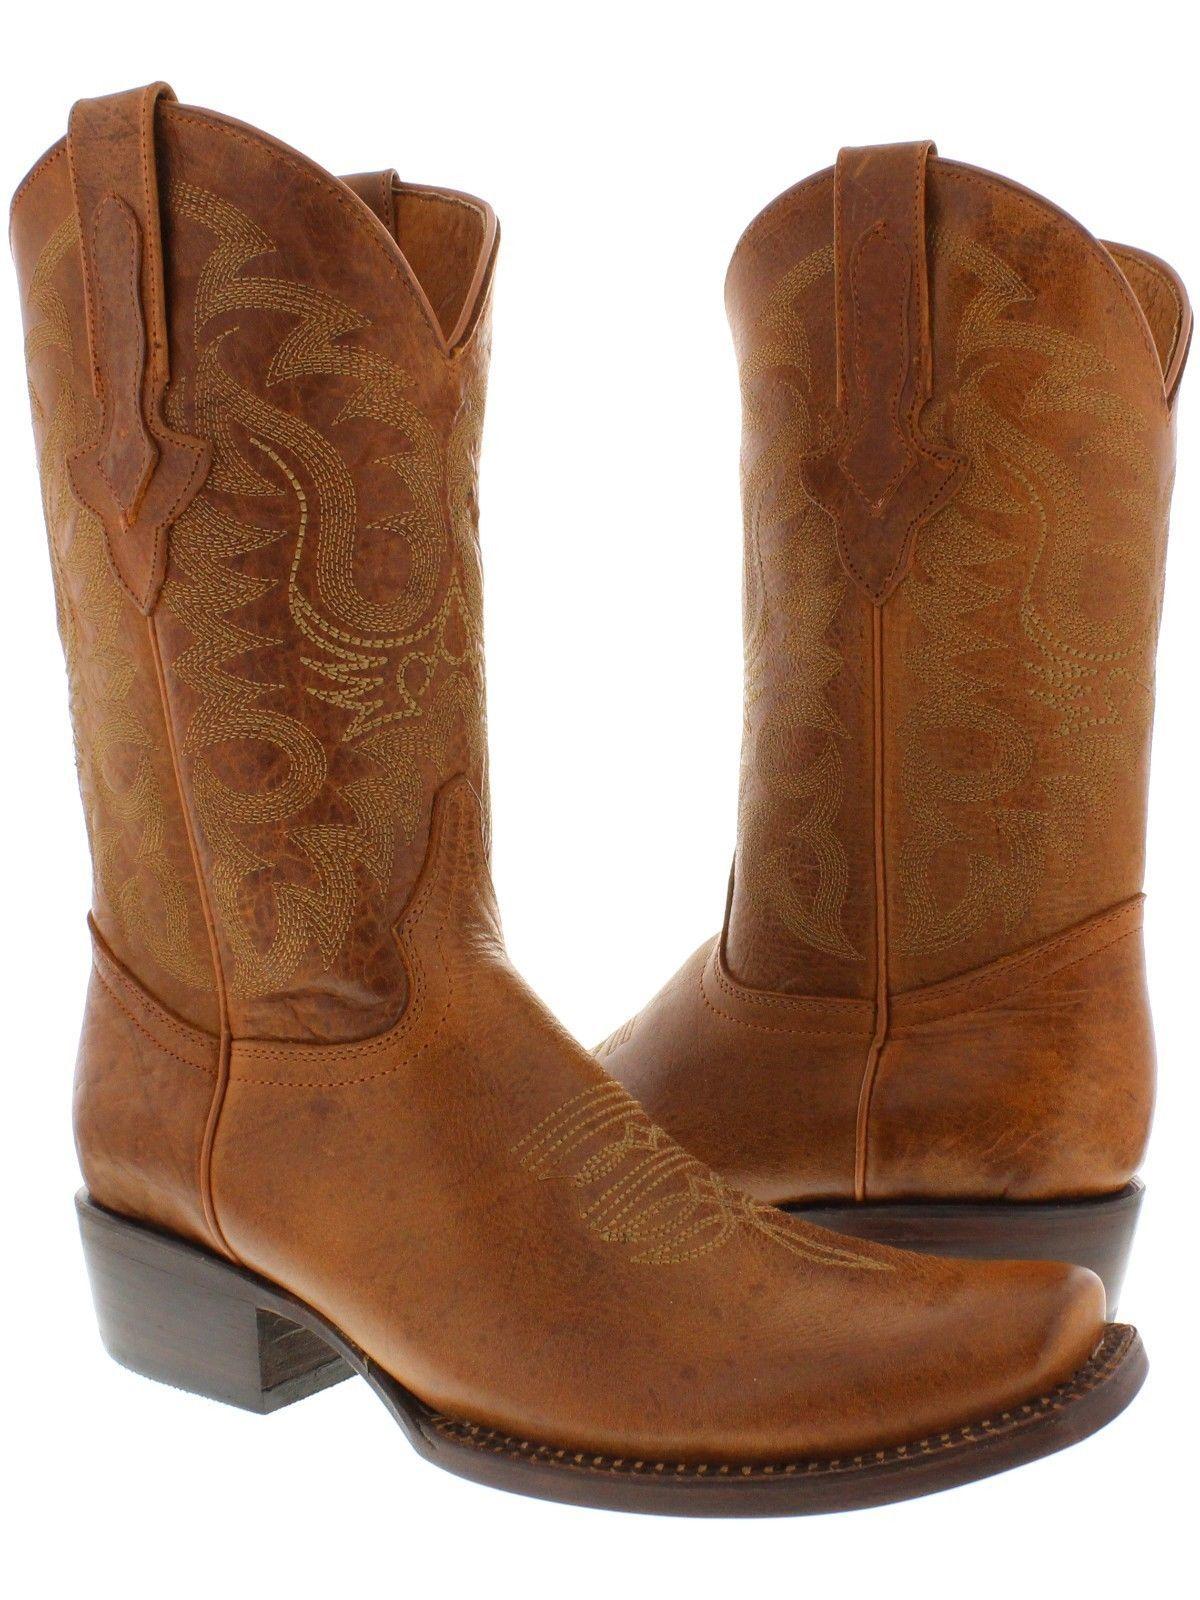 Men's cowboy boots cognac plain soft leather classic western biker rodeo  brown   Western boots for men, Boots, Mens cowboy boots